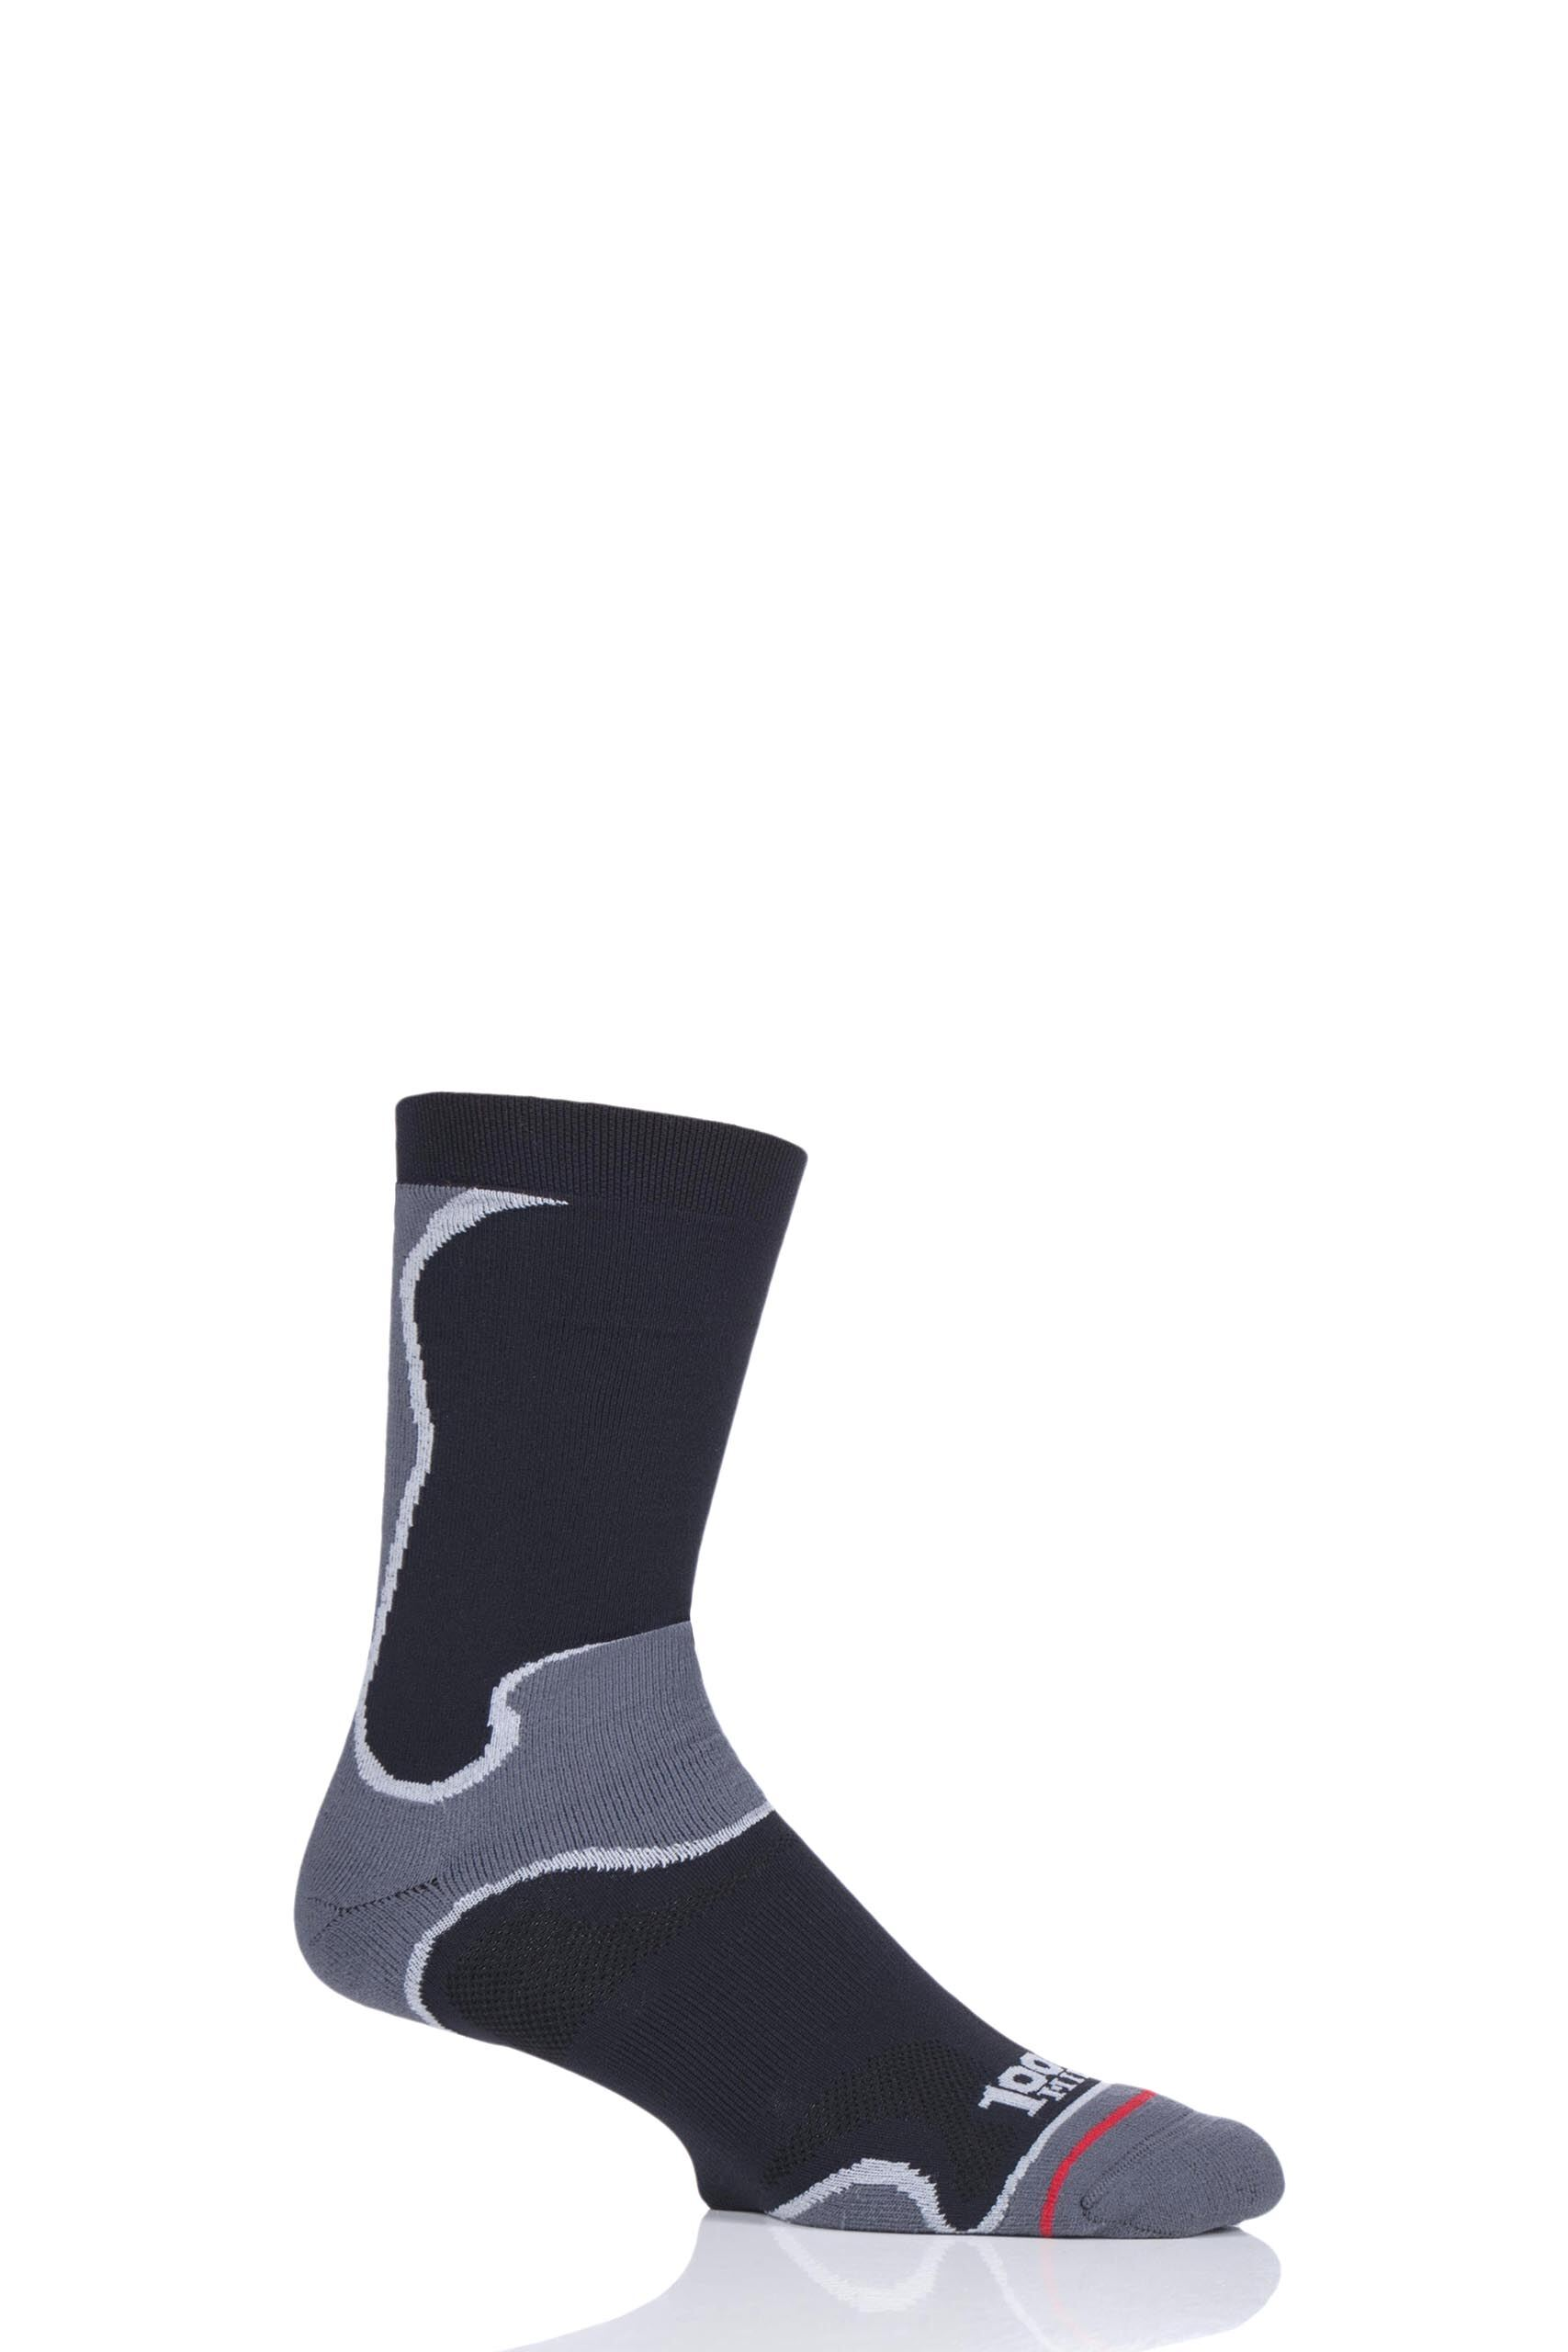 Image of 1 Pair Black Athletic Fusion Socks Unisex 12-14 Mens - 1000 Mile